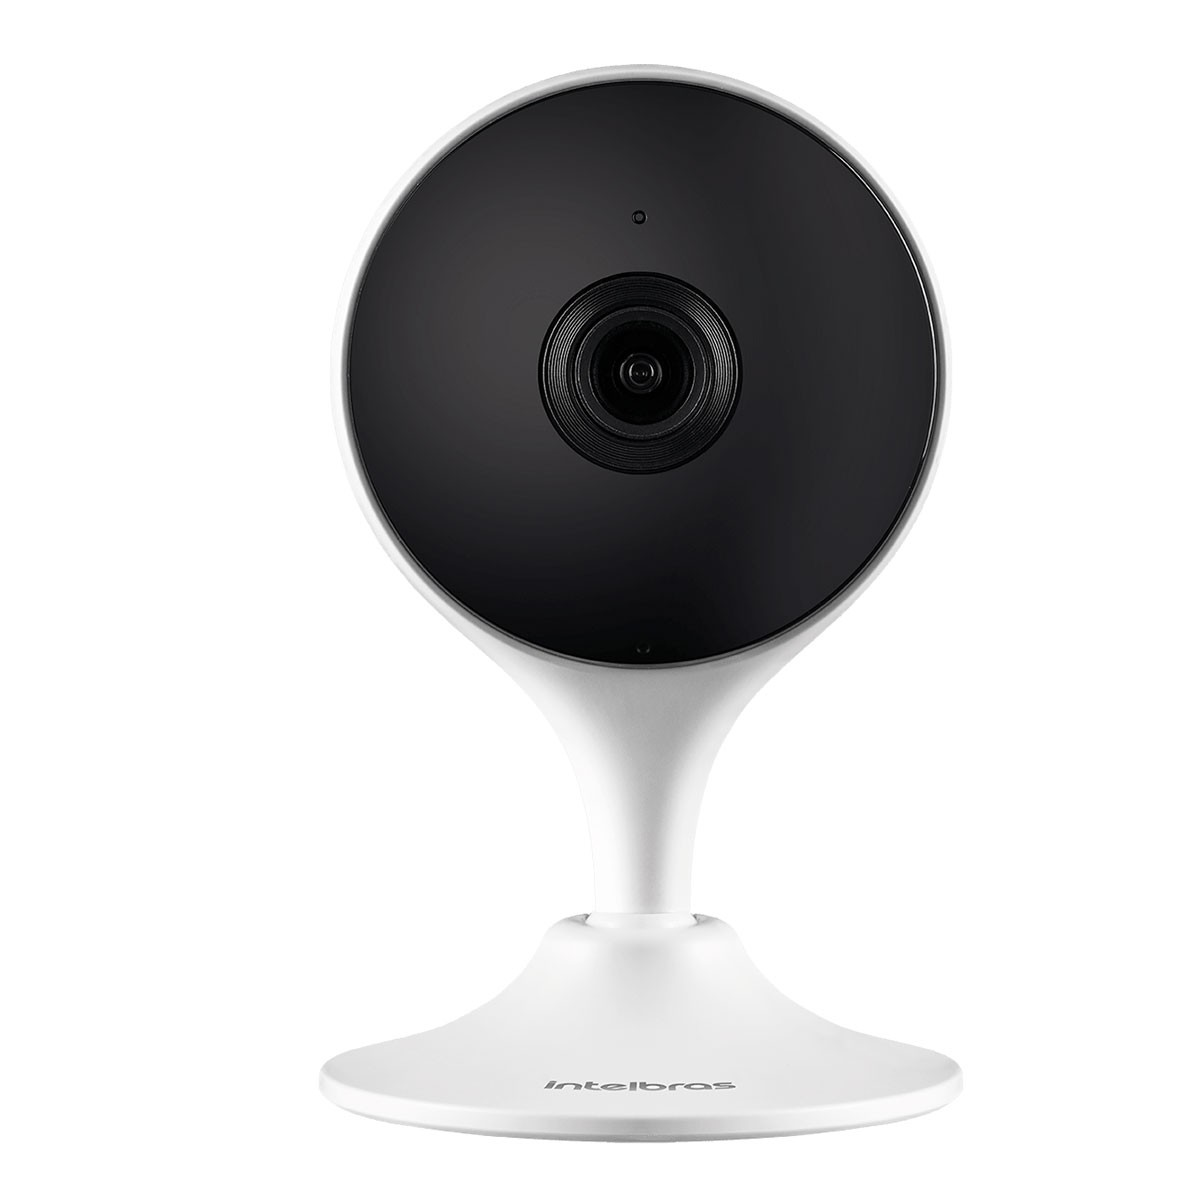 Camera Mibo Infra Im3 Wifi Full Hd 1080p Com Audio Intelbras